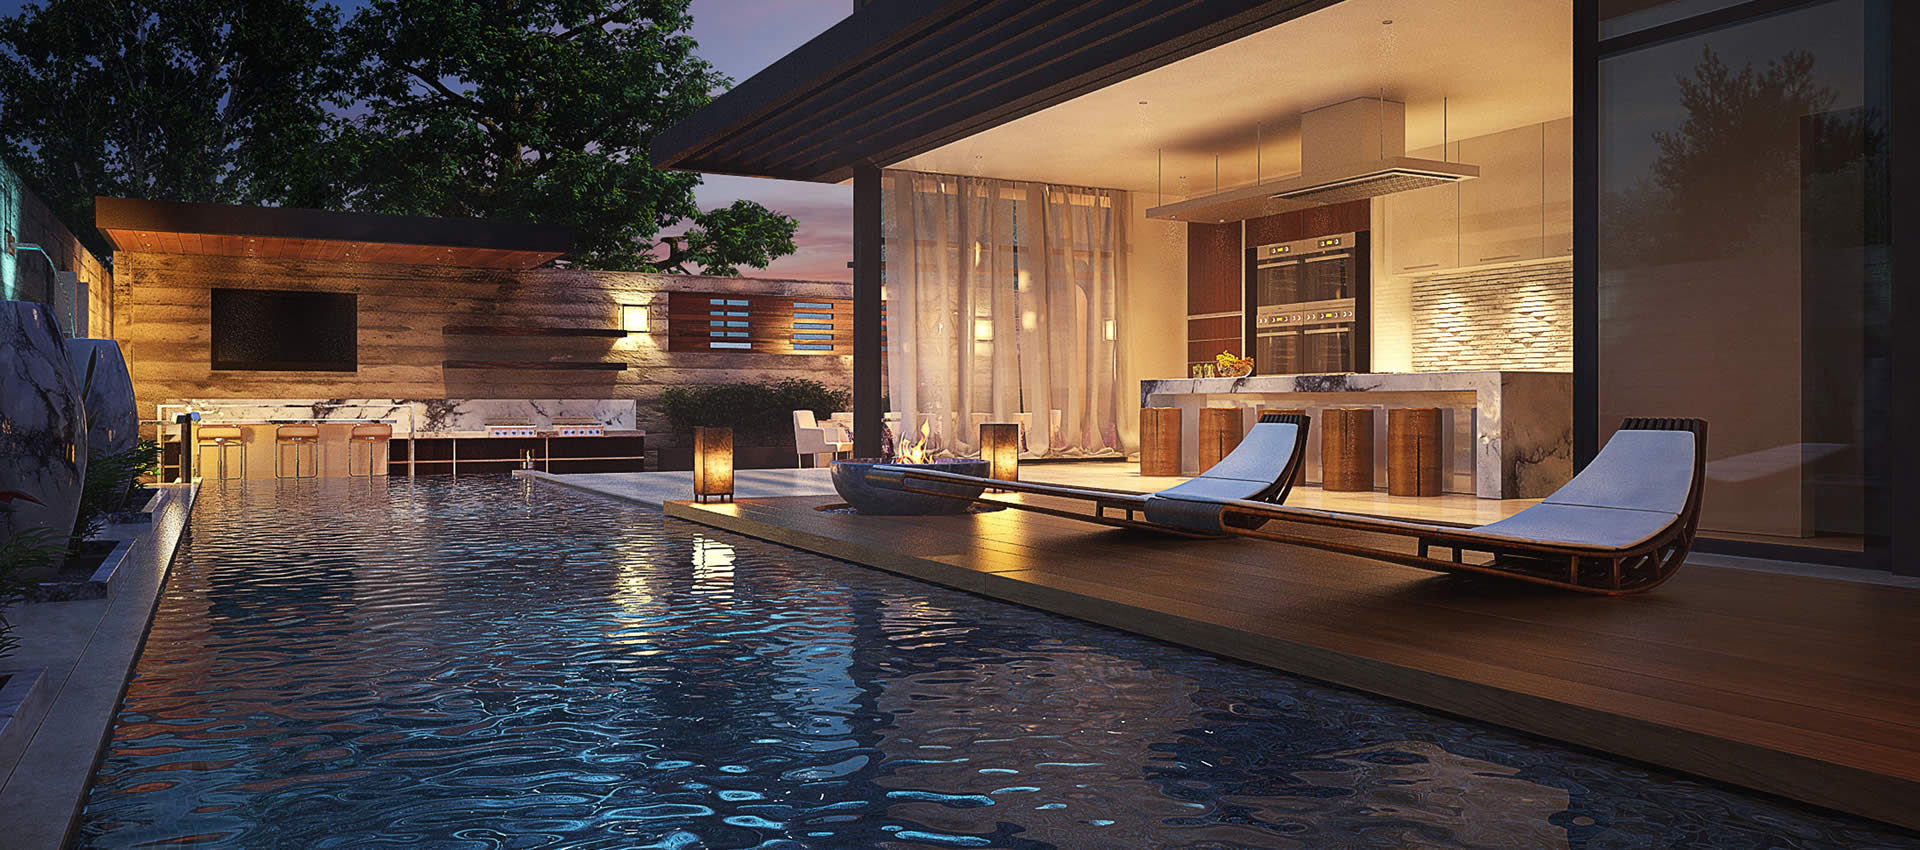 Los angeles pool builders southern california swimming - Best hotel swimming pools in los angeles ...